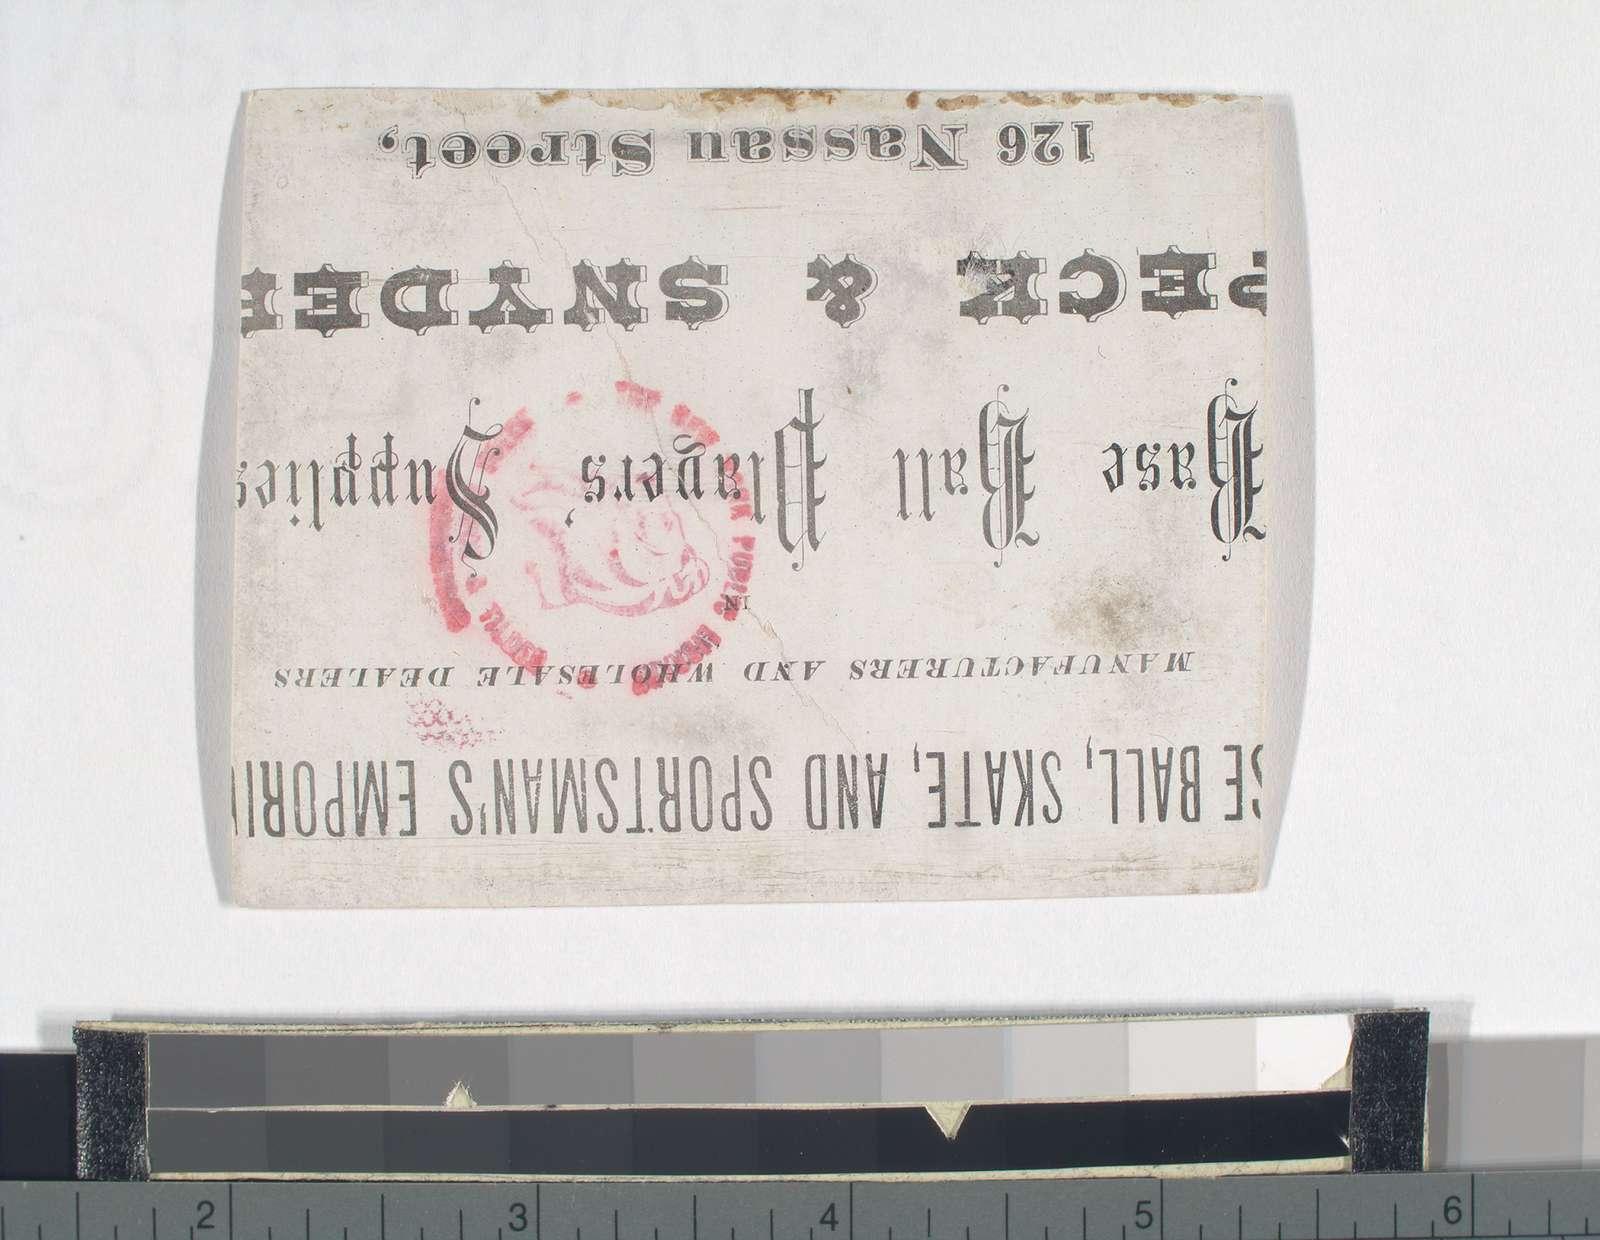 Athletics, Philadelphia, 1870. A. J. Reach, F. G. Malone, W. D. Fisler, T. J. Pratt, J. S. Sensenderfer, H. C. Schafer, Thos. Berry, G. Bechtel, J. Radcliff.